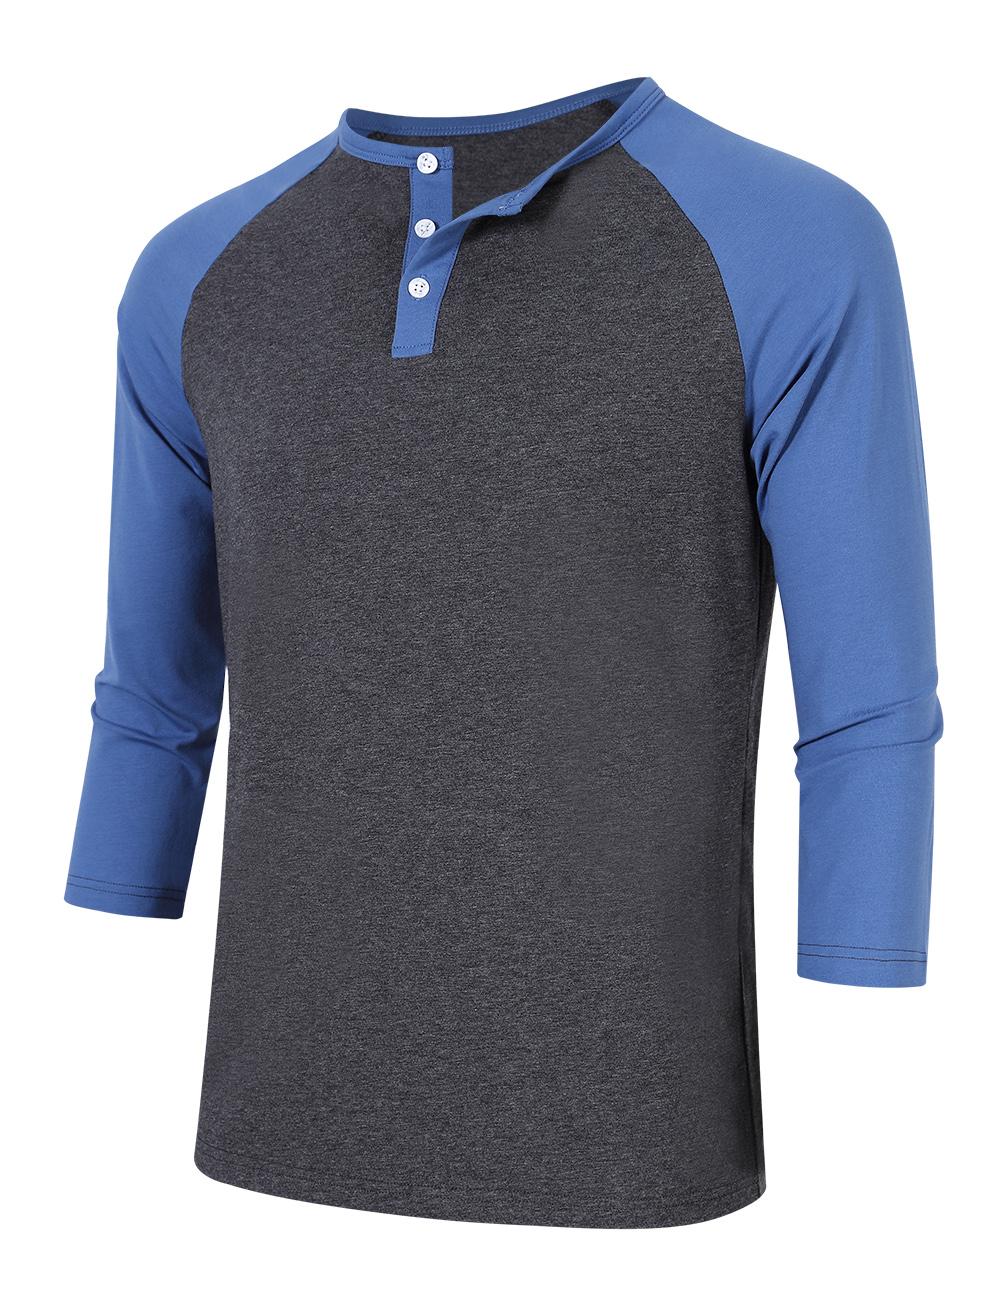 Men 39 s baseball henley tee shirt tops 3 4 raglan sleeve for Mens colored t shirts